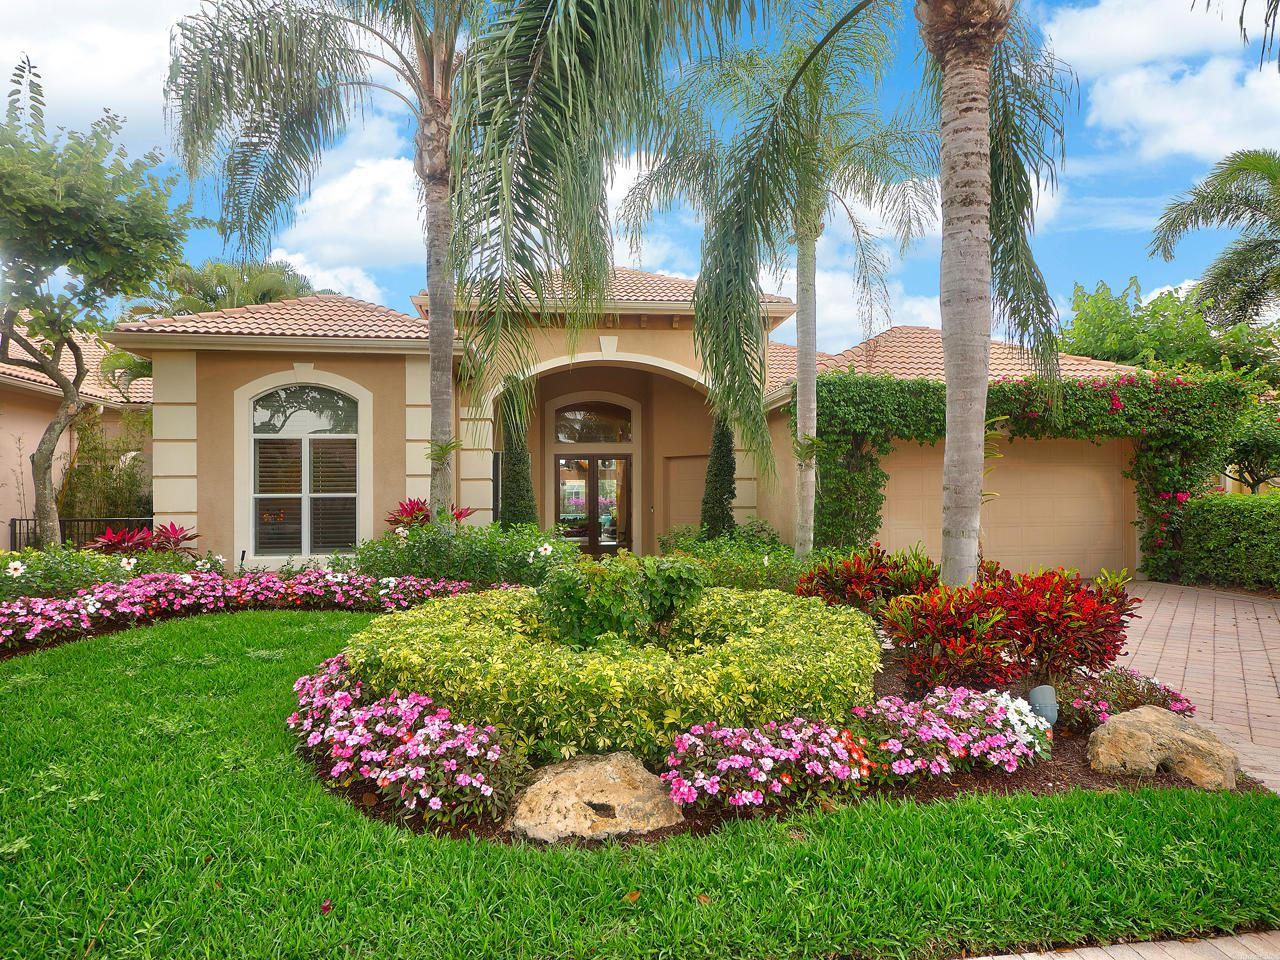 Photo of 120 Vintageisle Lane, Palm Beach Gardens, FL 33418 (MLS # RX-10619671)